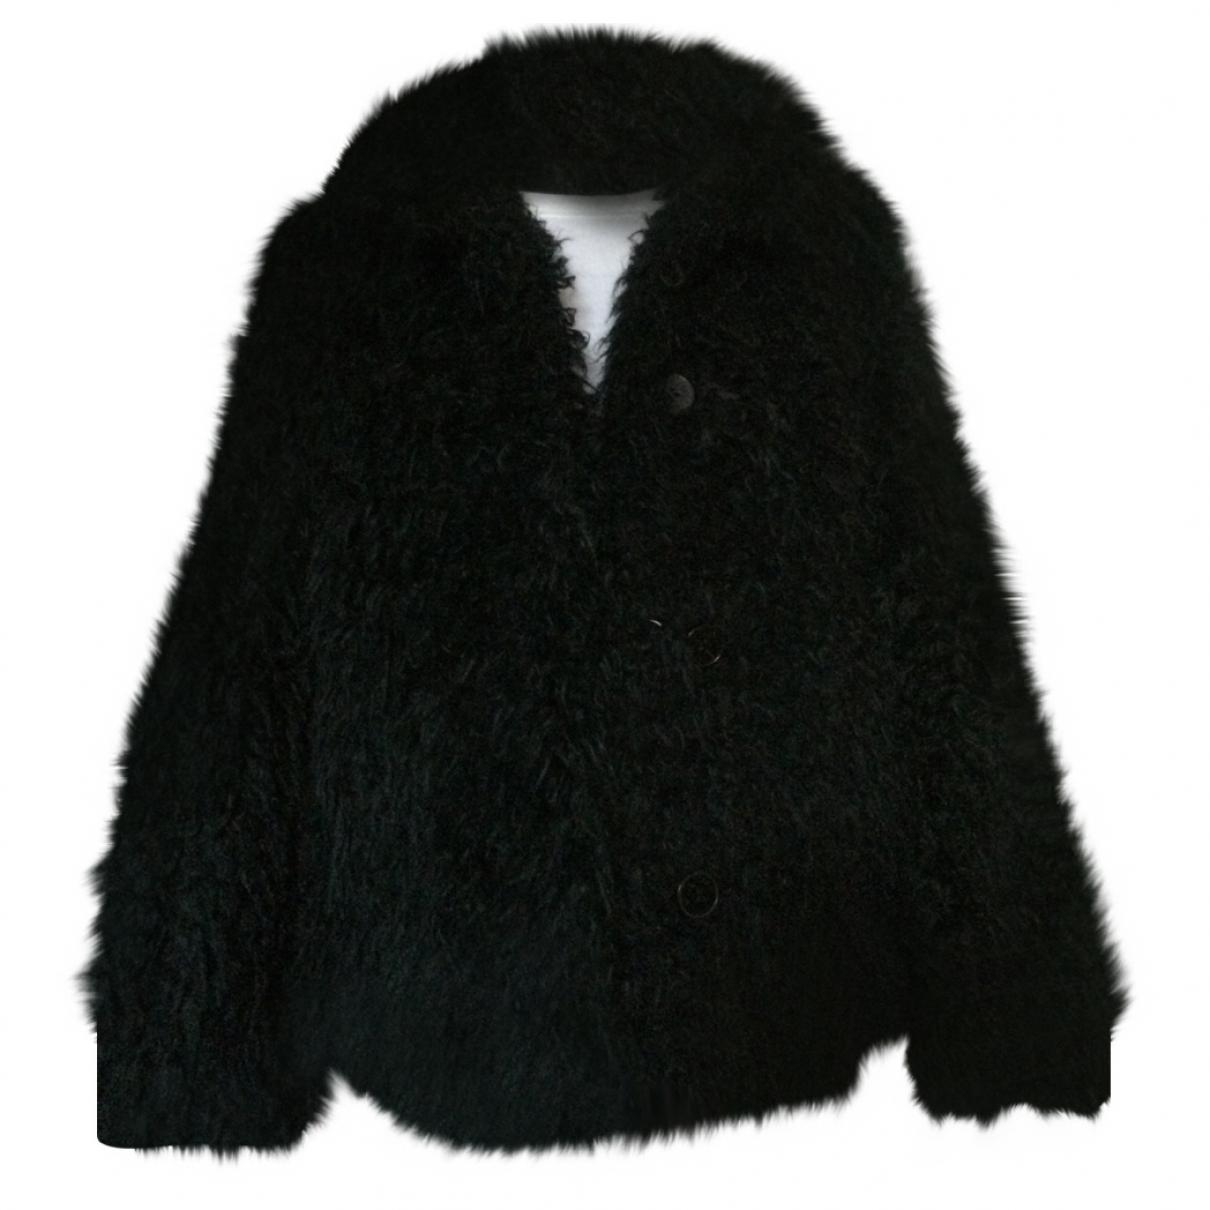 Zadig & Voltaire \N Black Faux fur coat for Women 36 FR